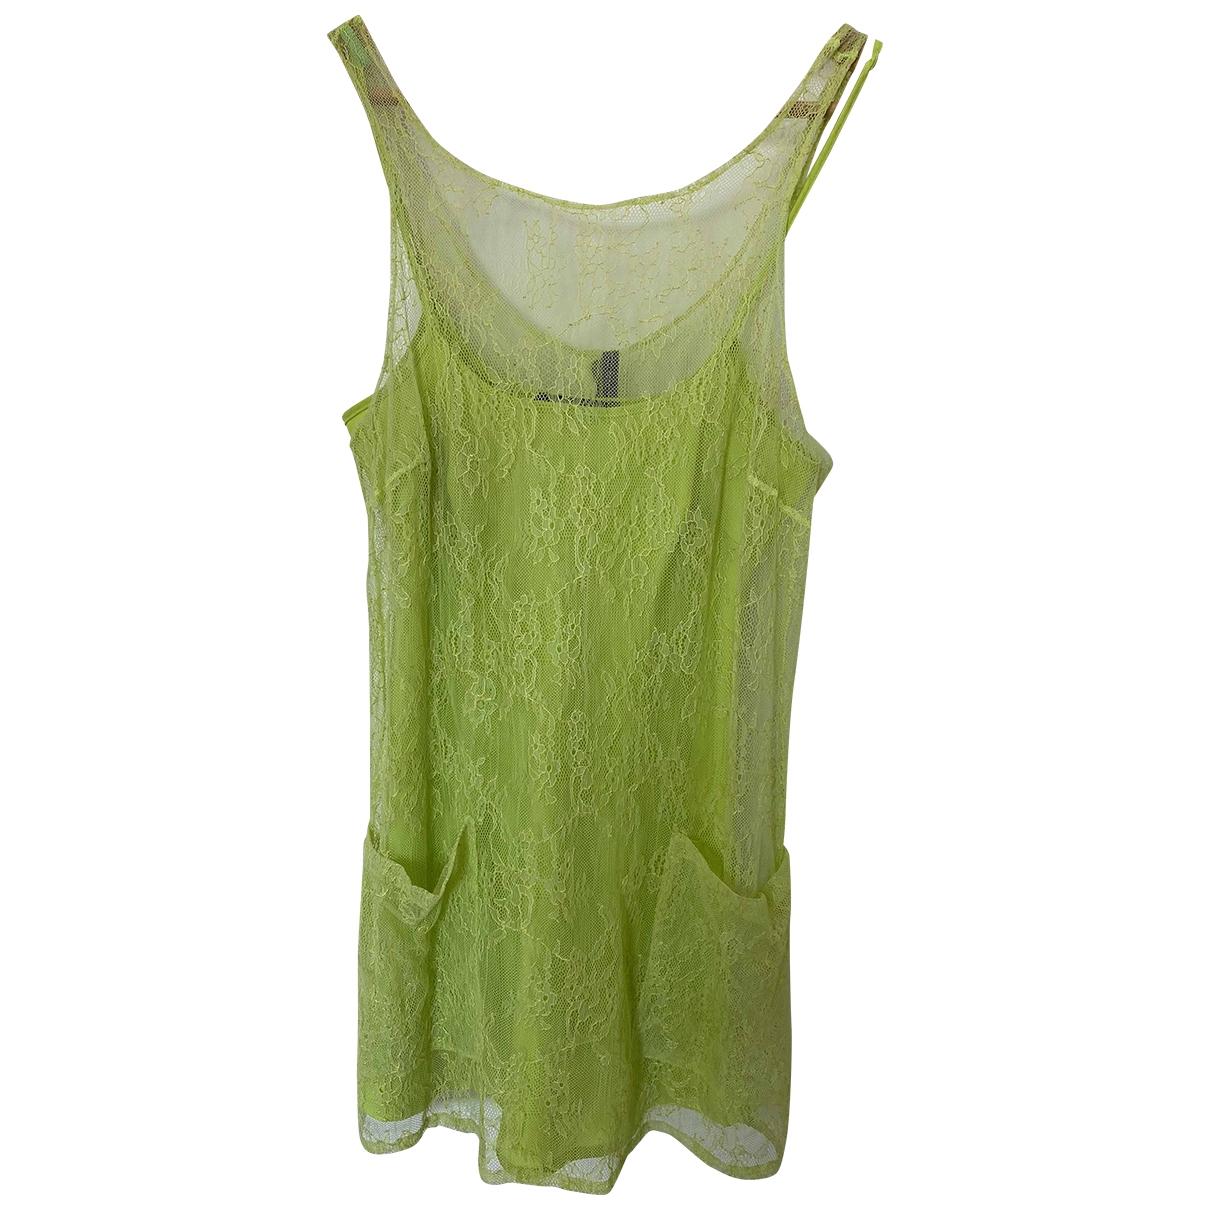 Patrizia Pepe \N Lace dress for Women XS International